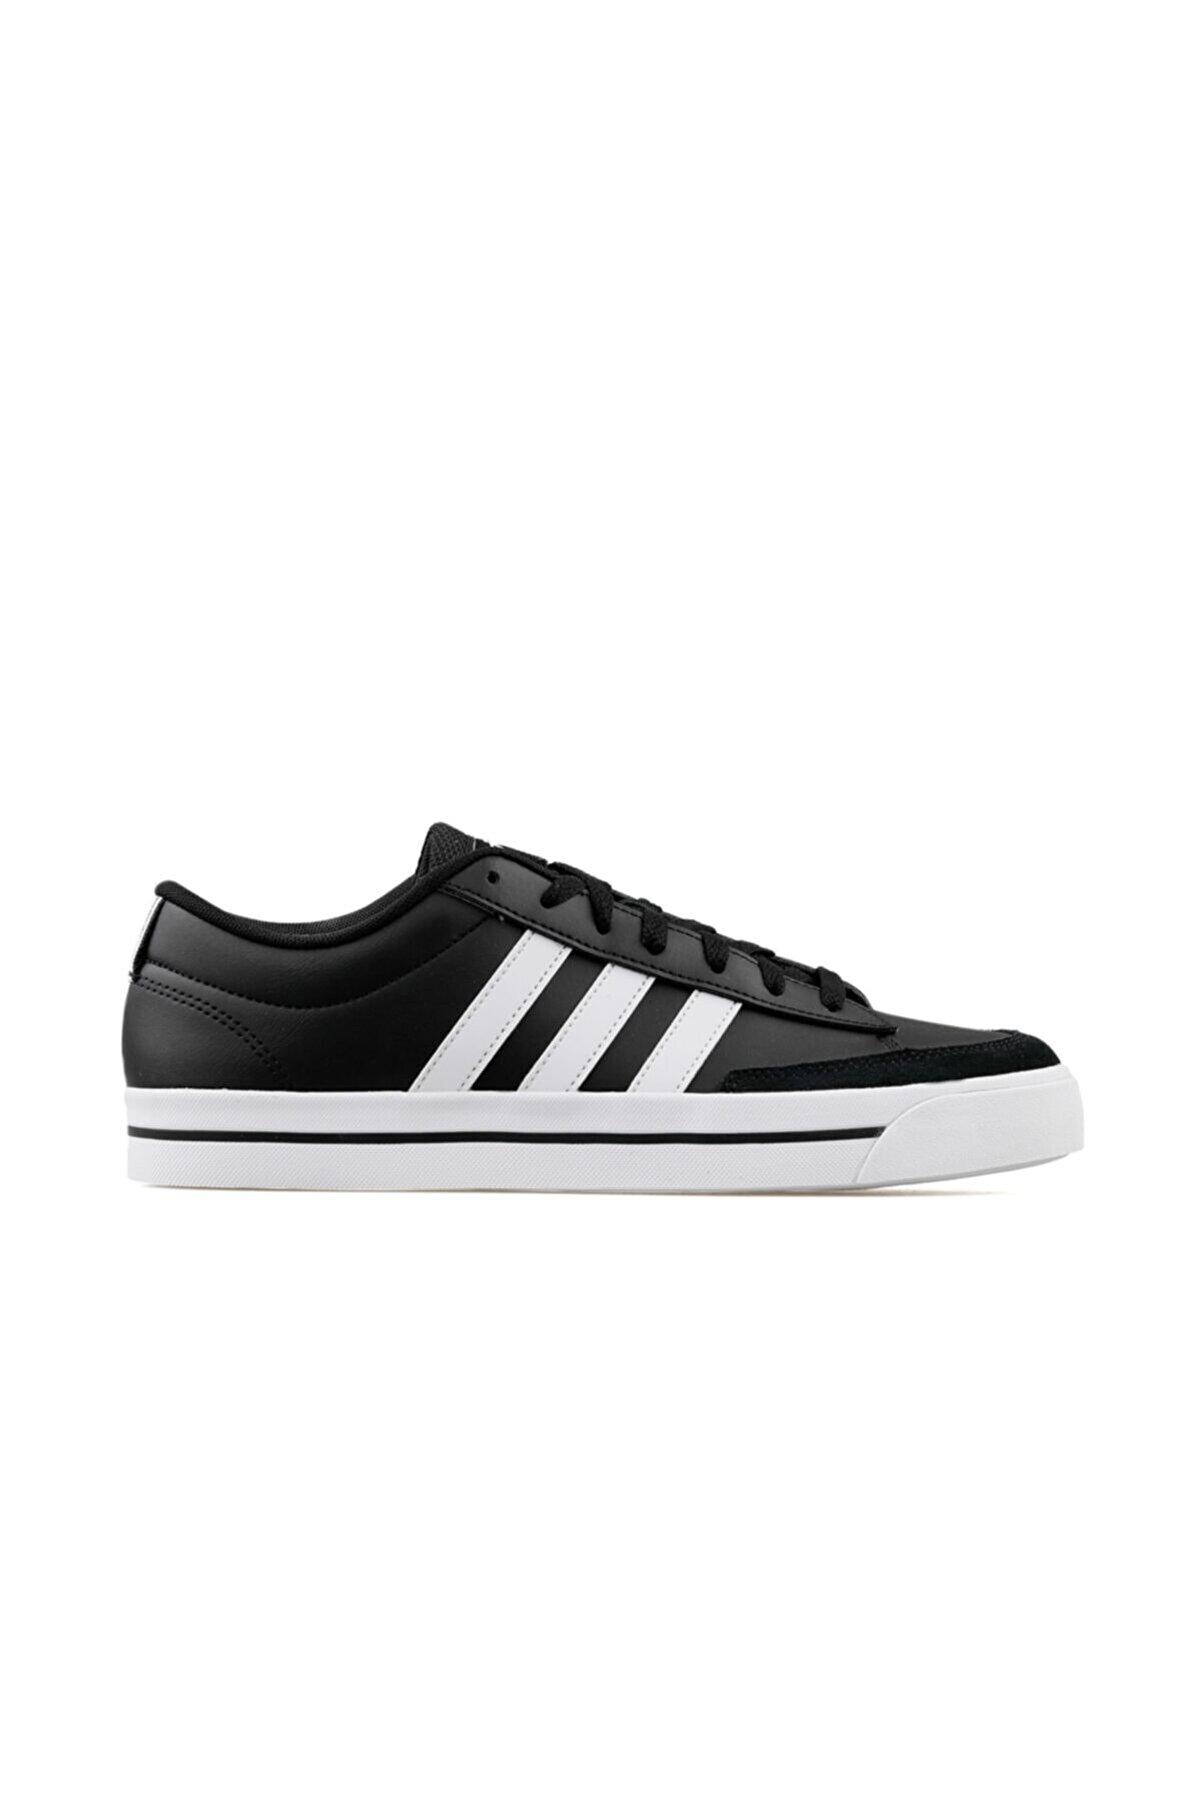 adidas Retrovulc Erkek Günlük Ayakkabı H02210 Siyah